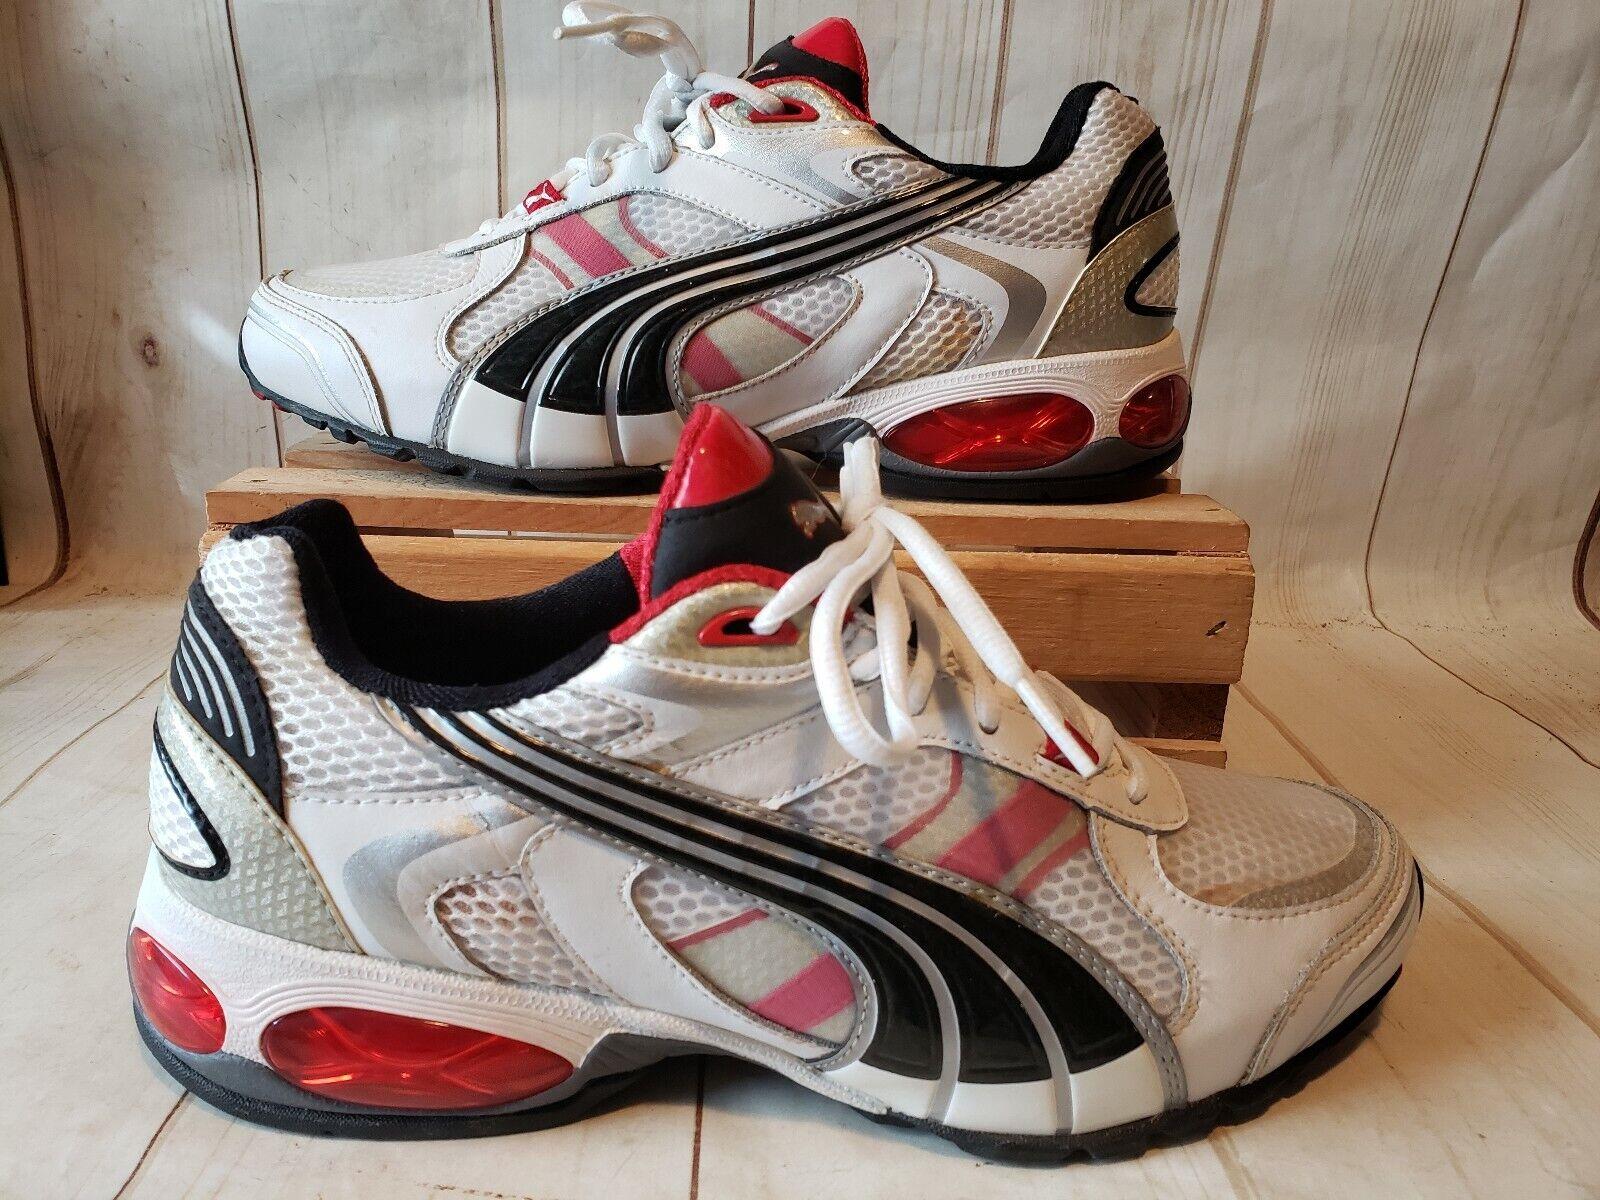 PUMA Cell Surin 2 Matte Training Running shoes Men Sz 7M White Red Blk 185498 01